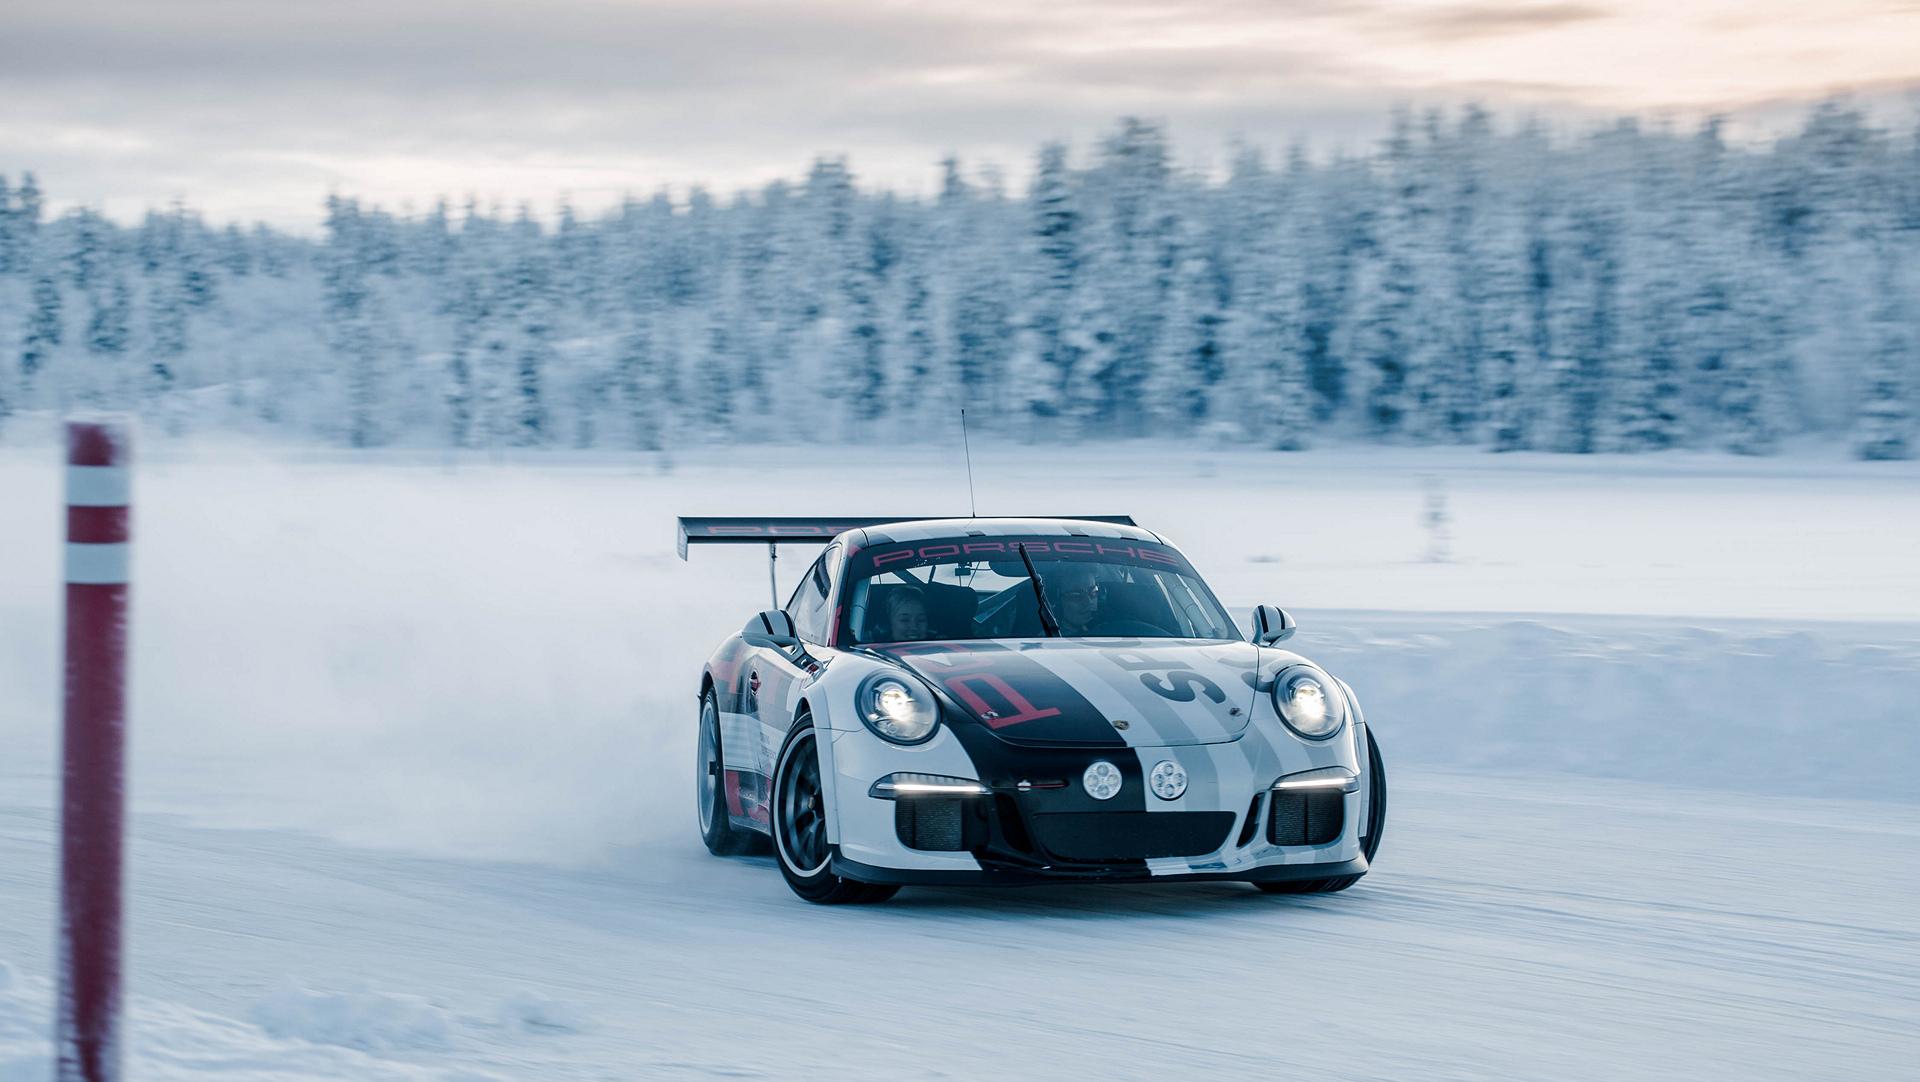 911 Gt3 Cup Porsche Driving Experience Winter Levi